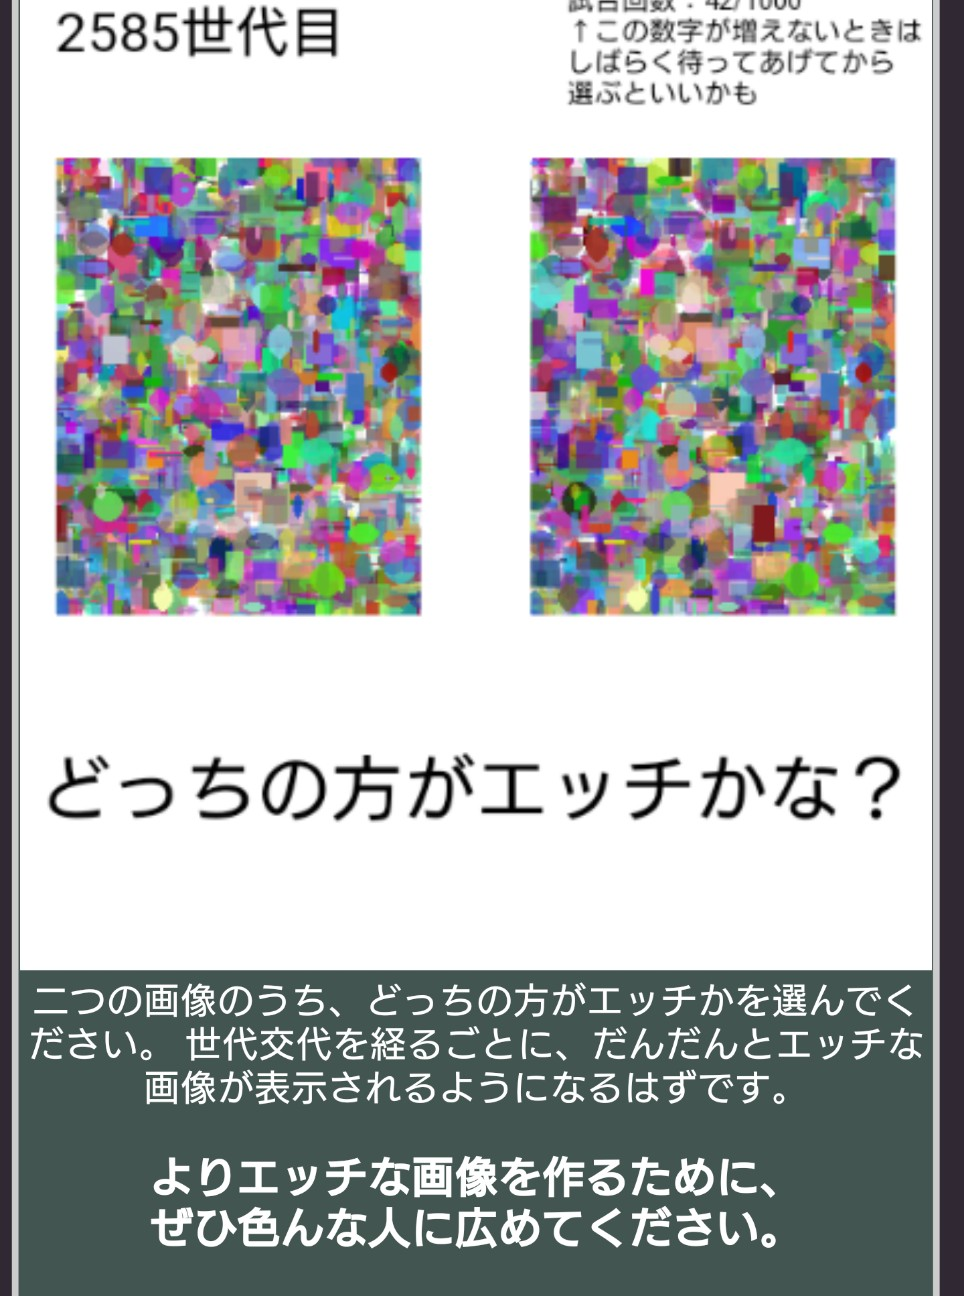 f:id:mouse_314:20210112234203j:image